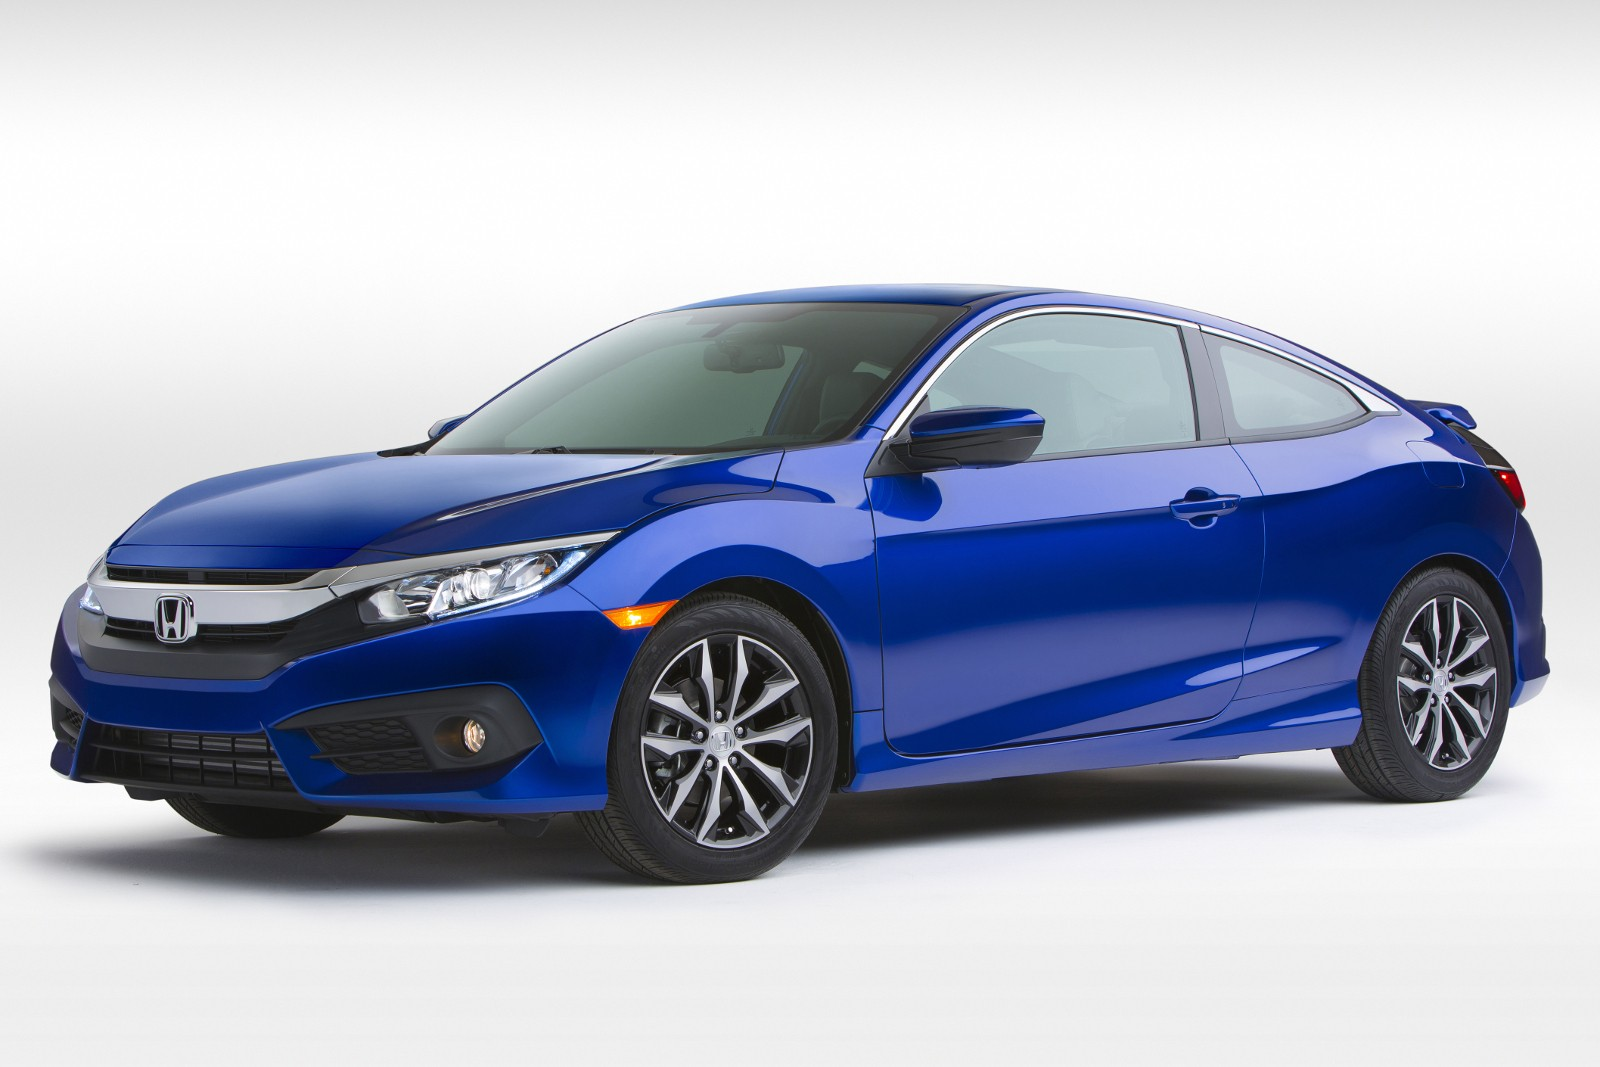 Honda Civic: 2016 Honda Civic Coupe Revealed With Bigger Cabin, Turbo